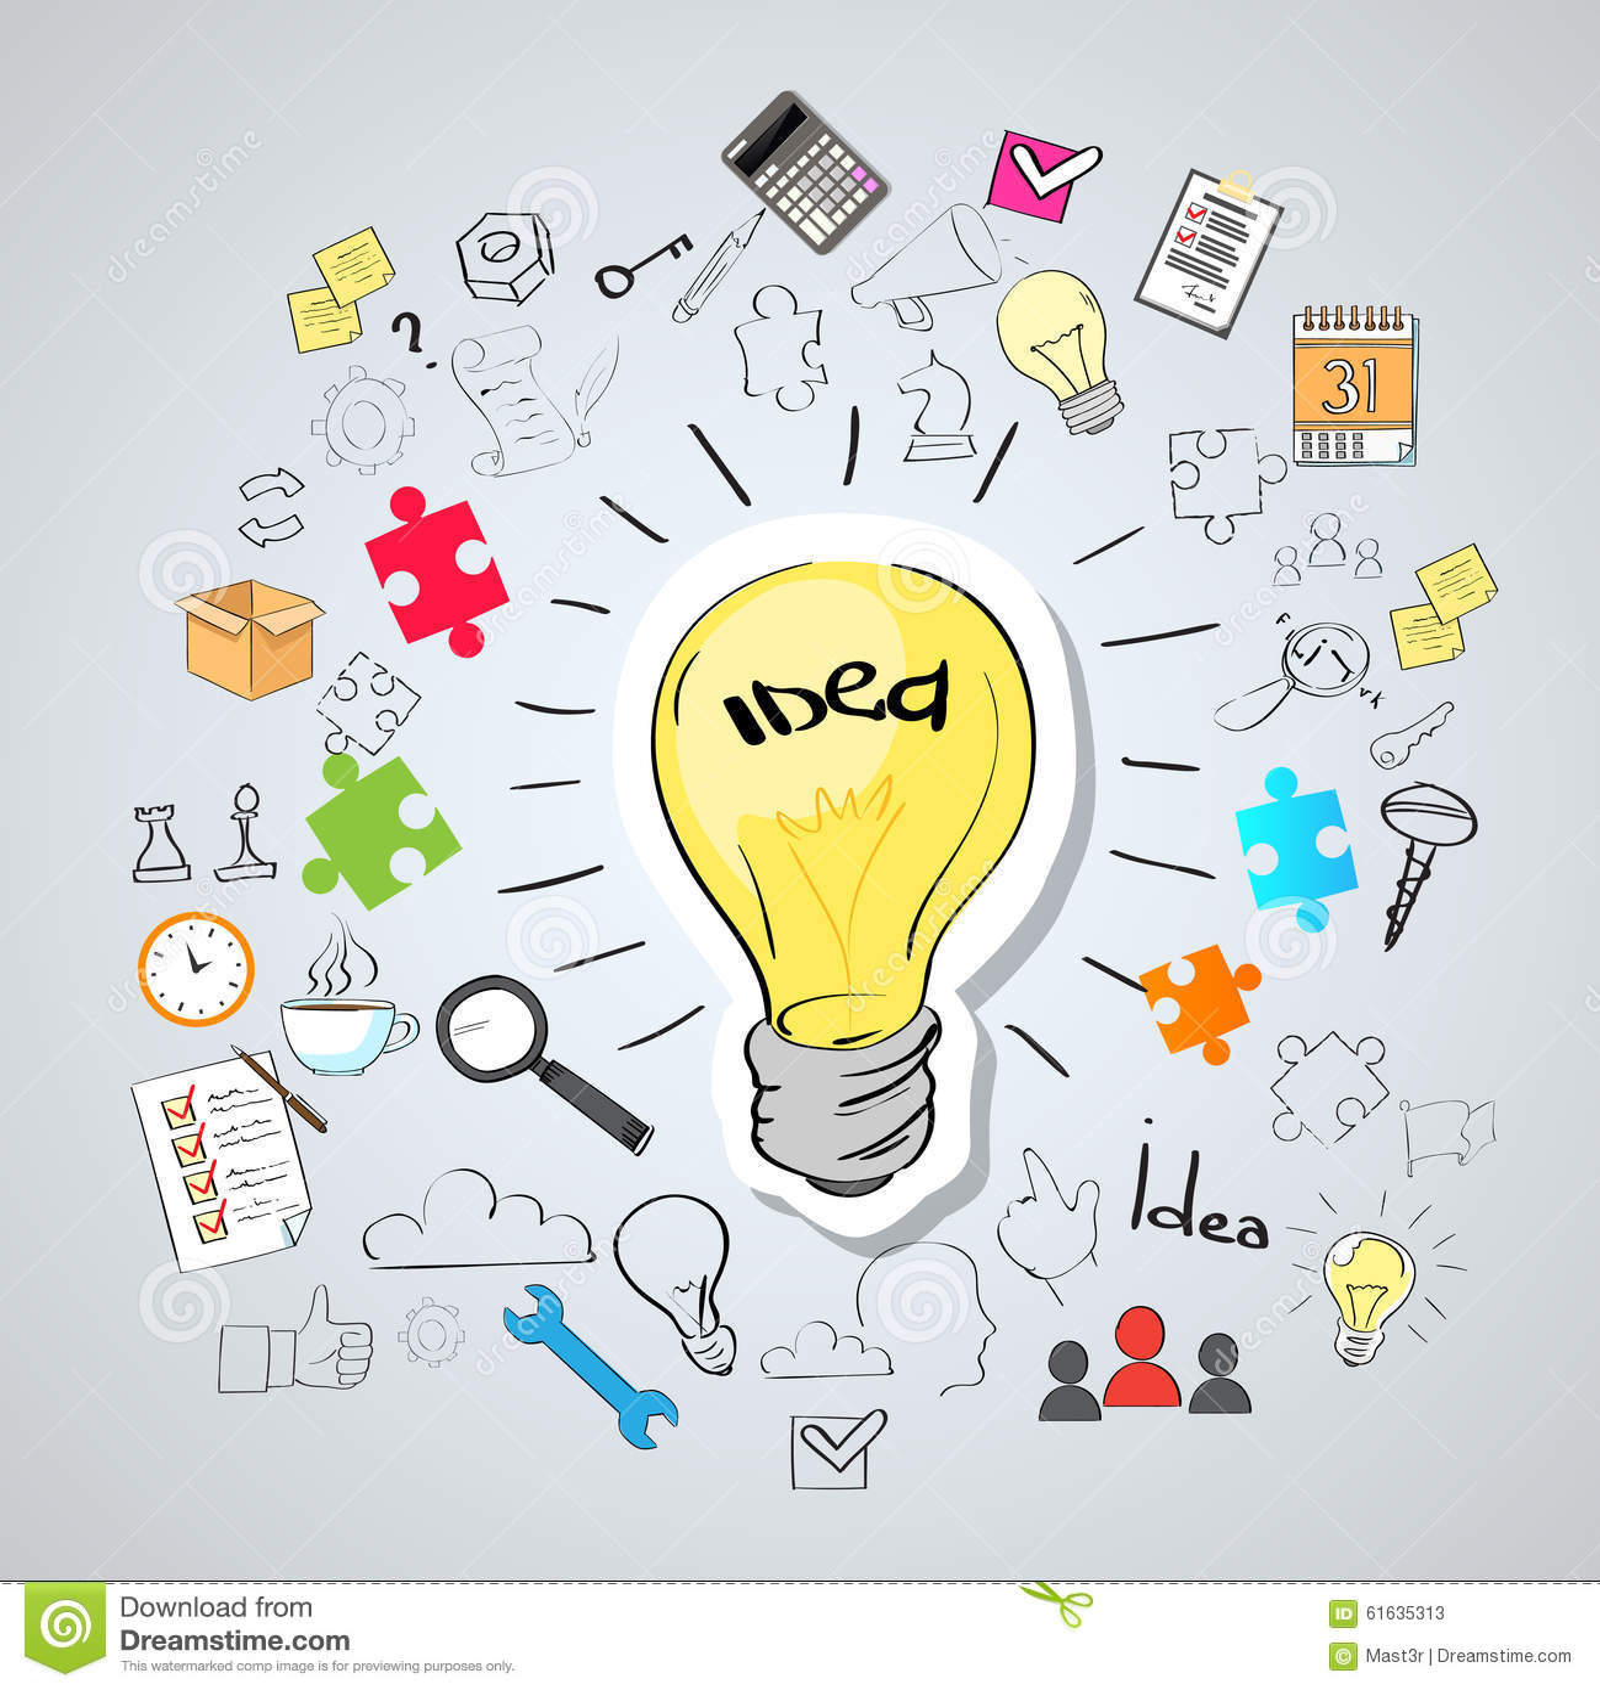 light bulb idea creative concept doodle stock vector